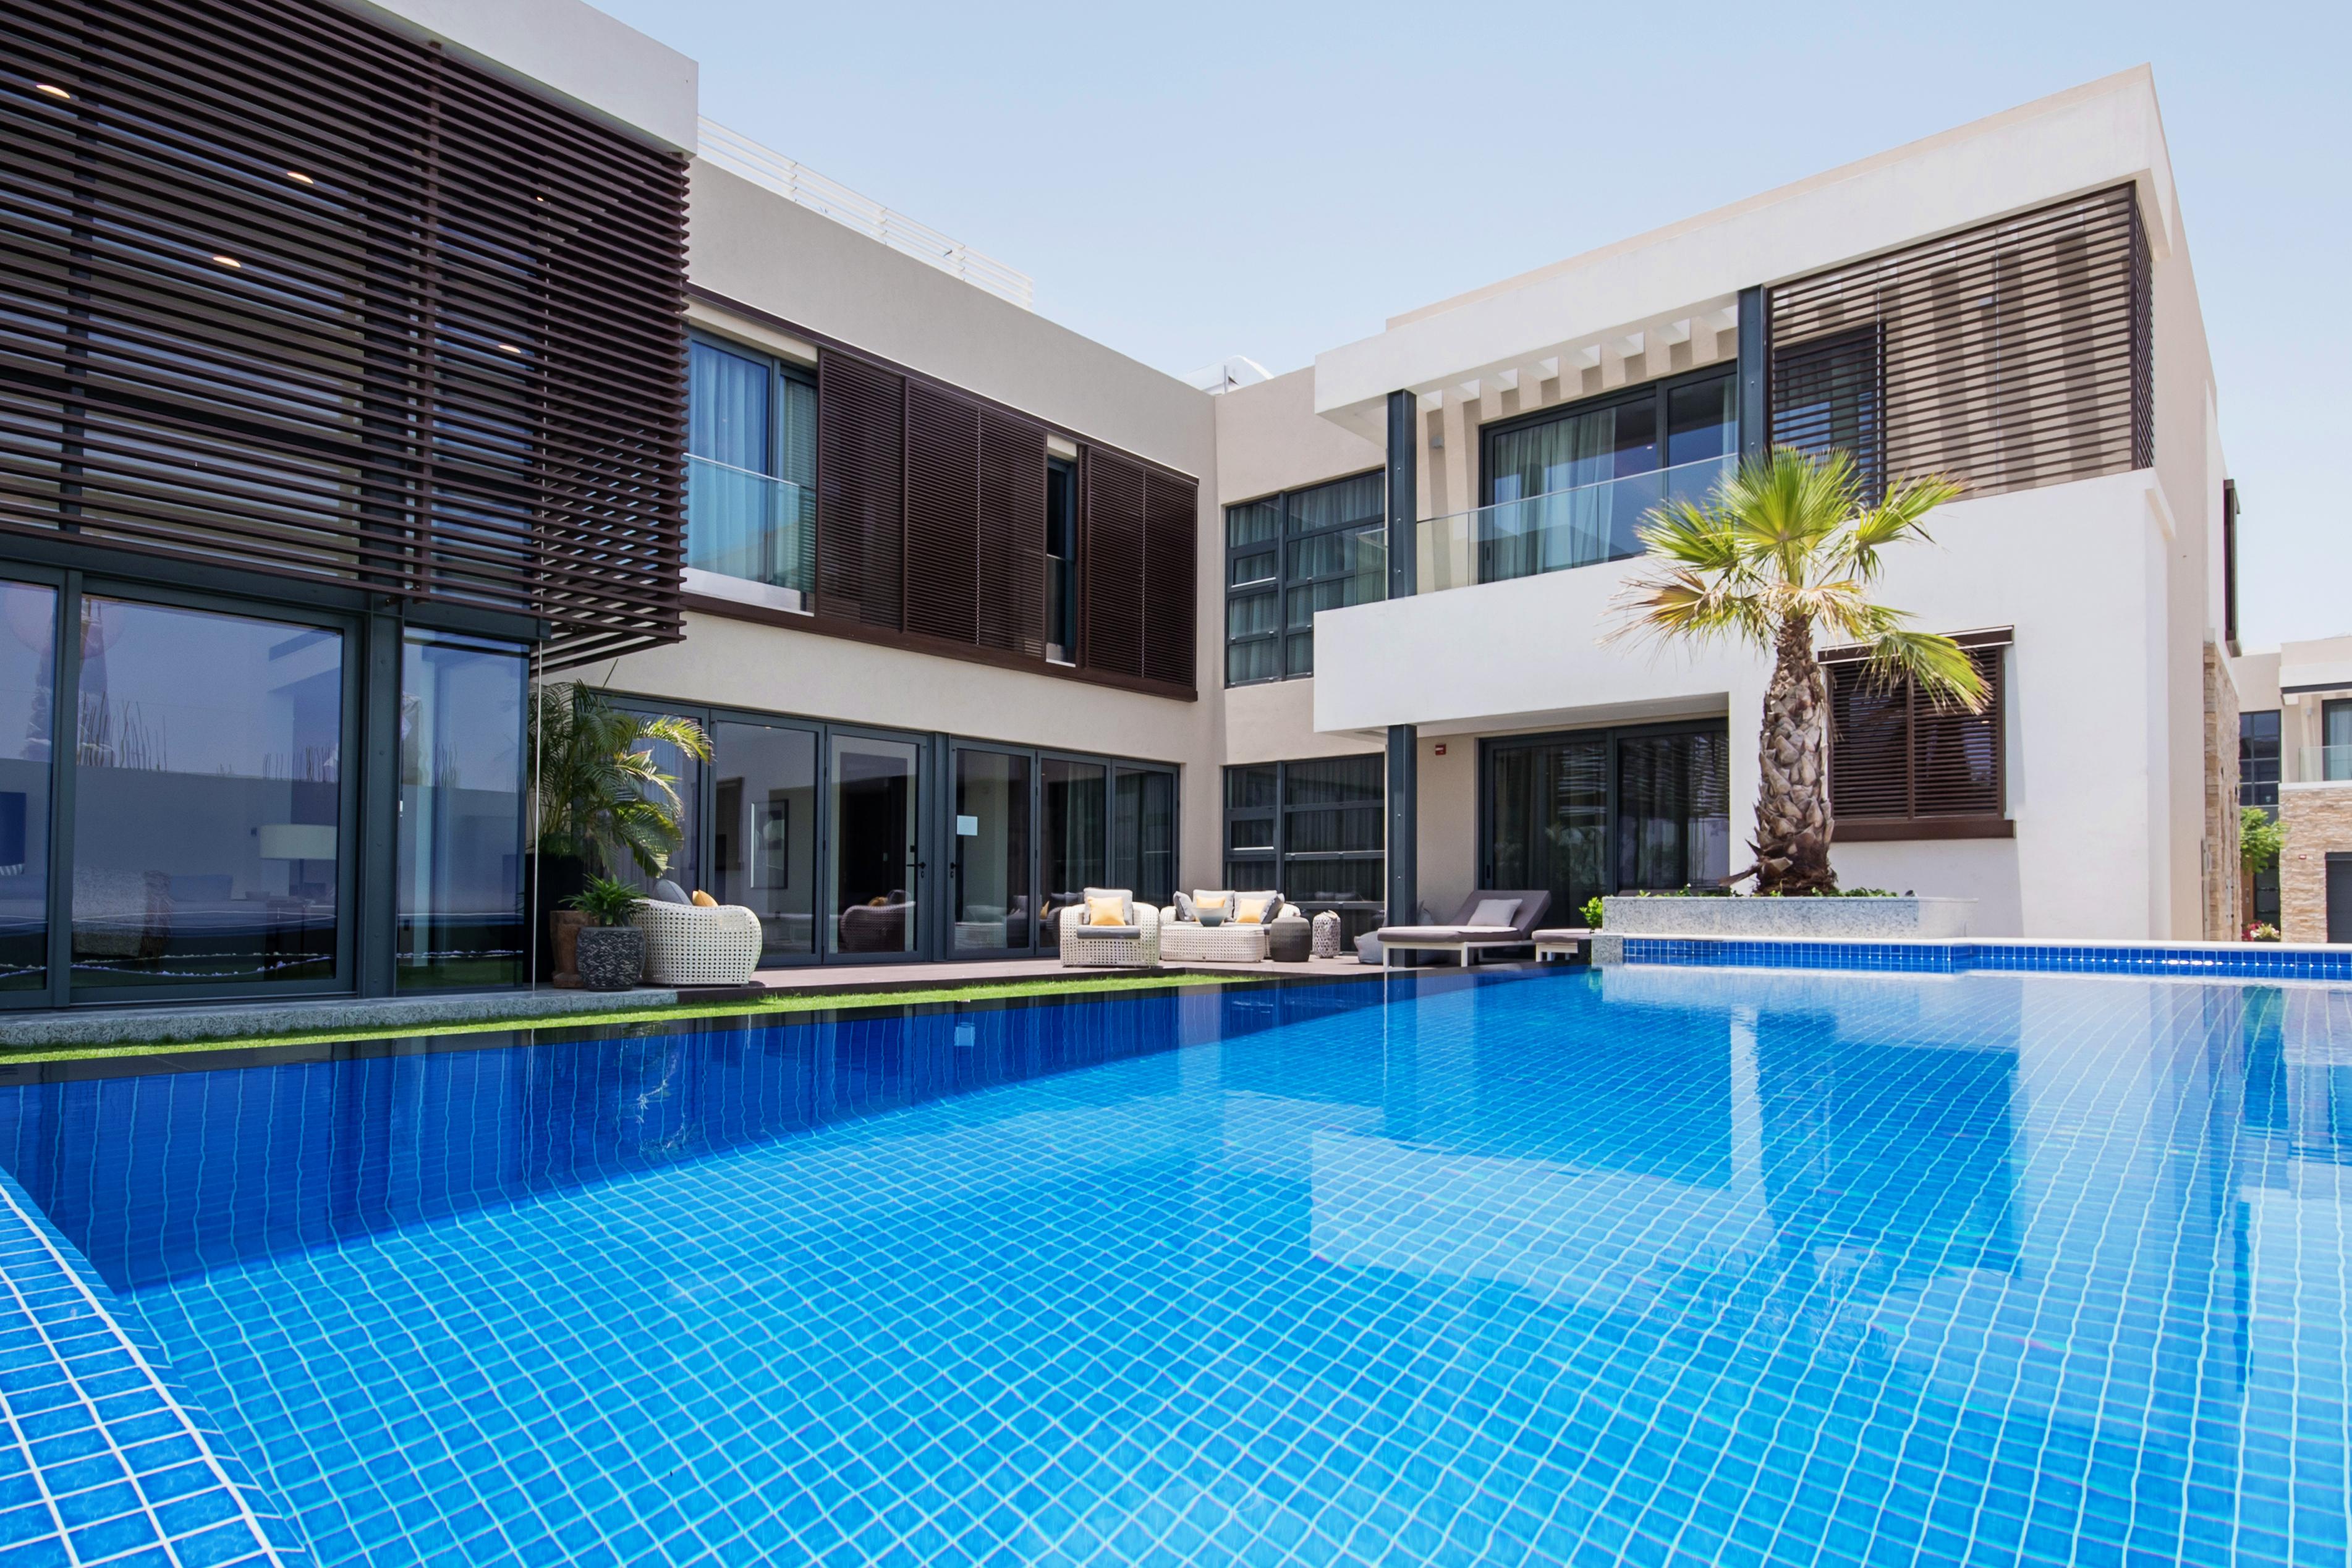 4 bedroom villa exterior (8)